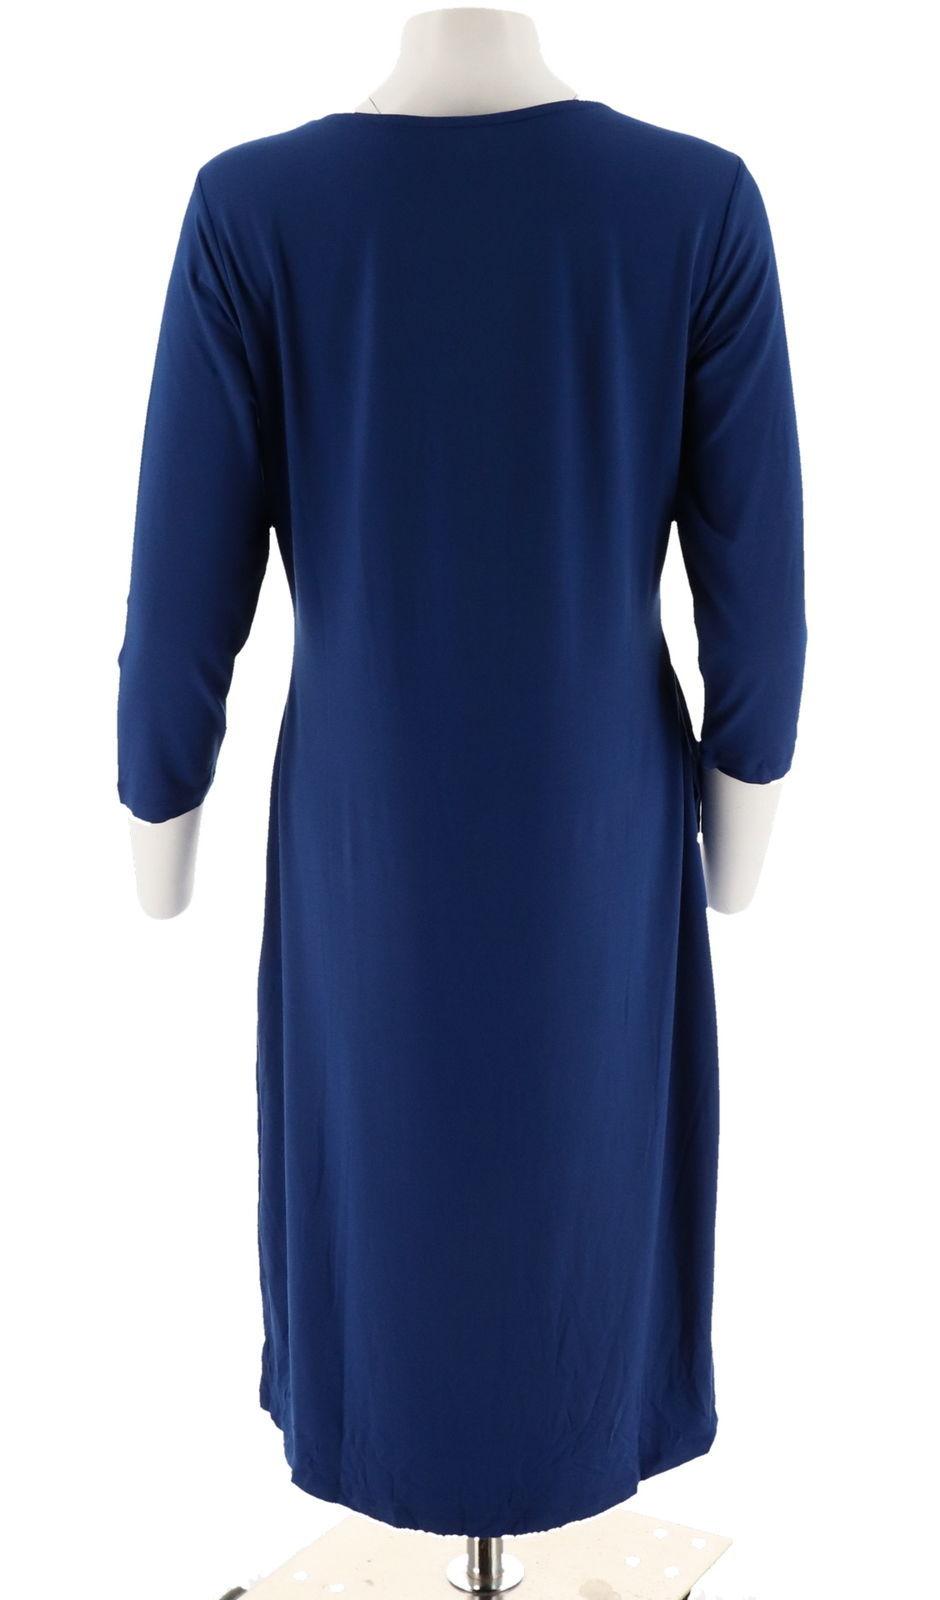 Halston 3/4 Slv Draped Front Crewneck Hi-Low Hem Dress Royal Blue XS NEW A280164 image 3